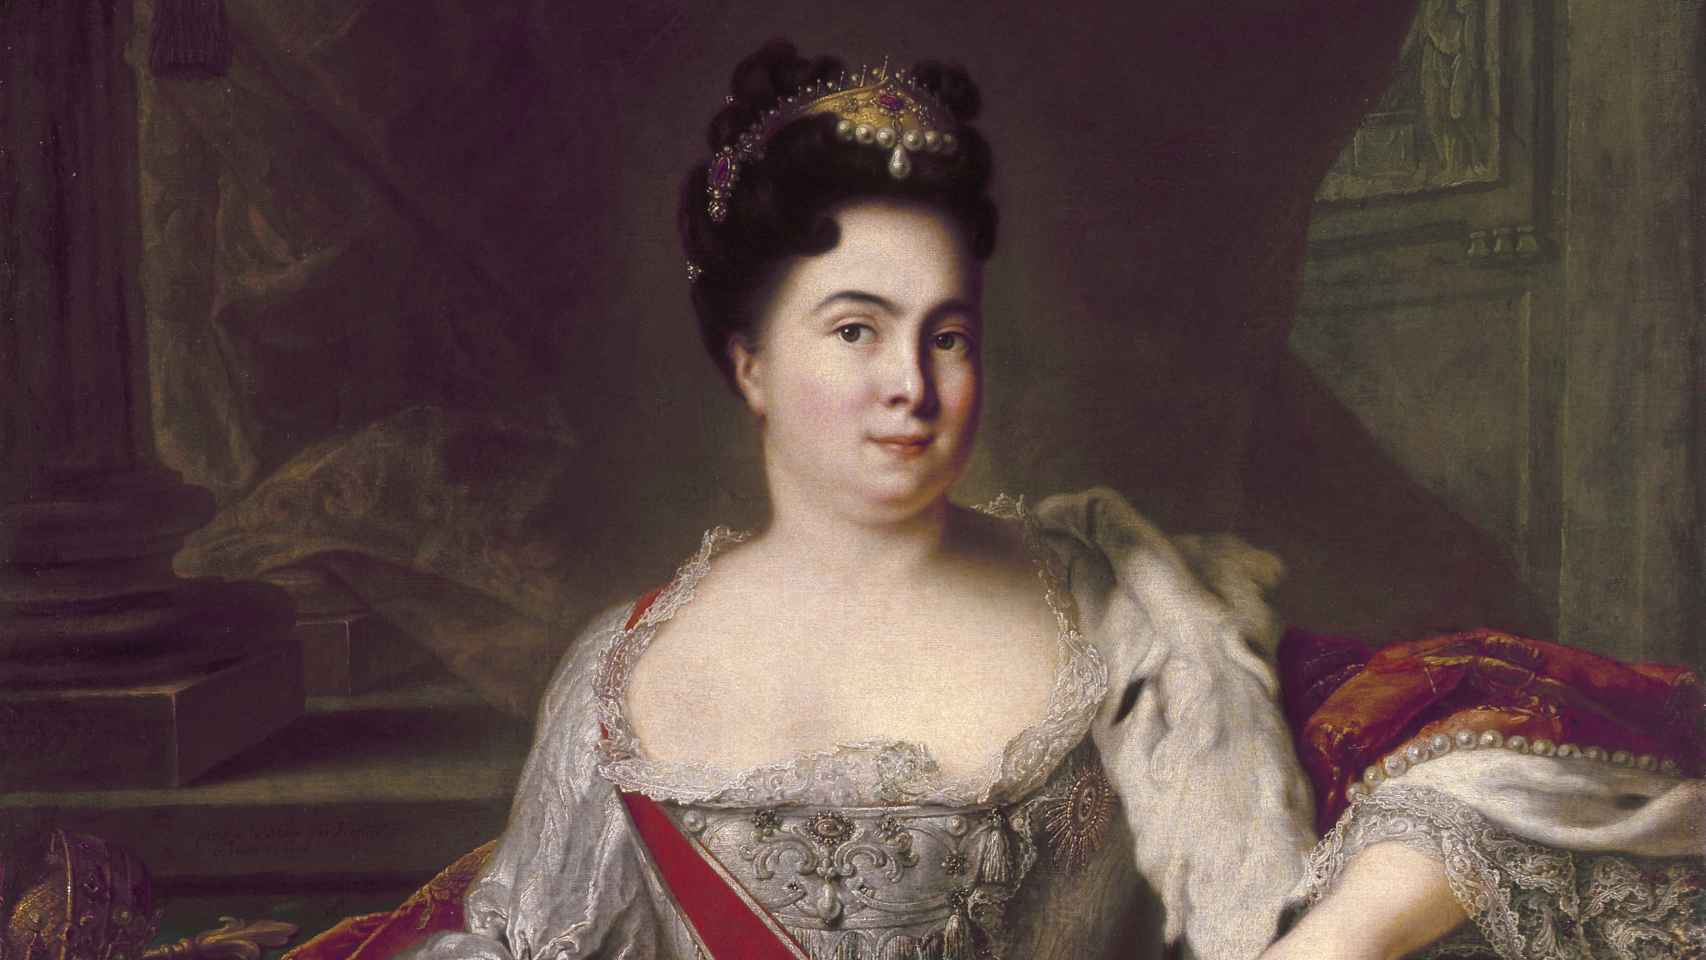 Retrato de Catalina I de Rusia.